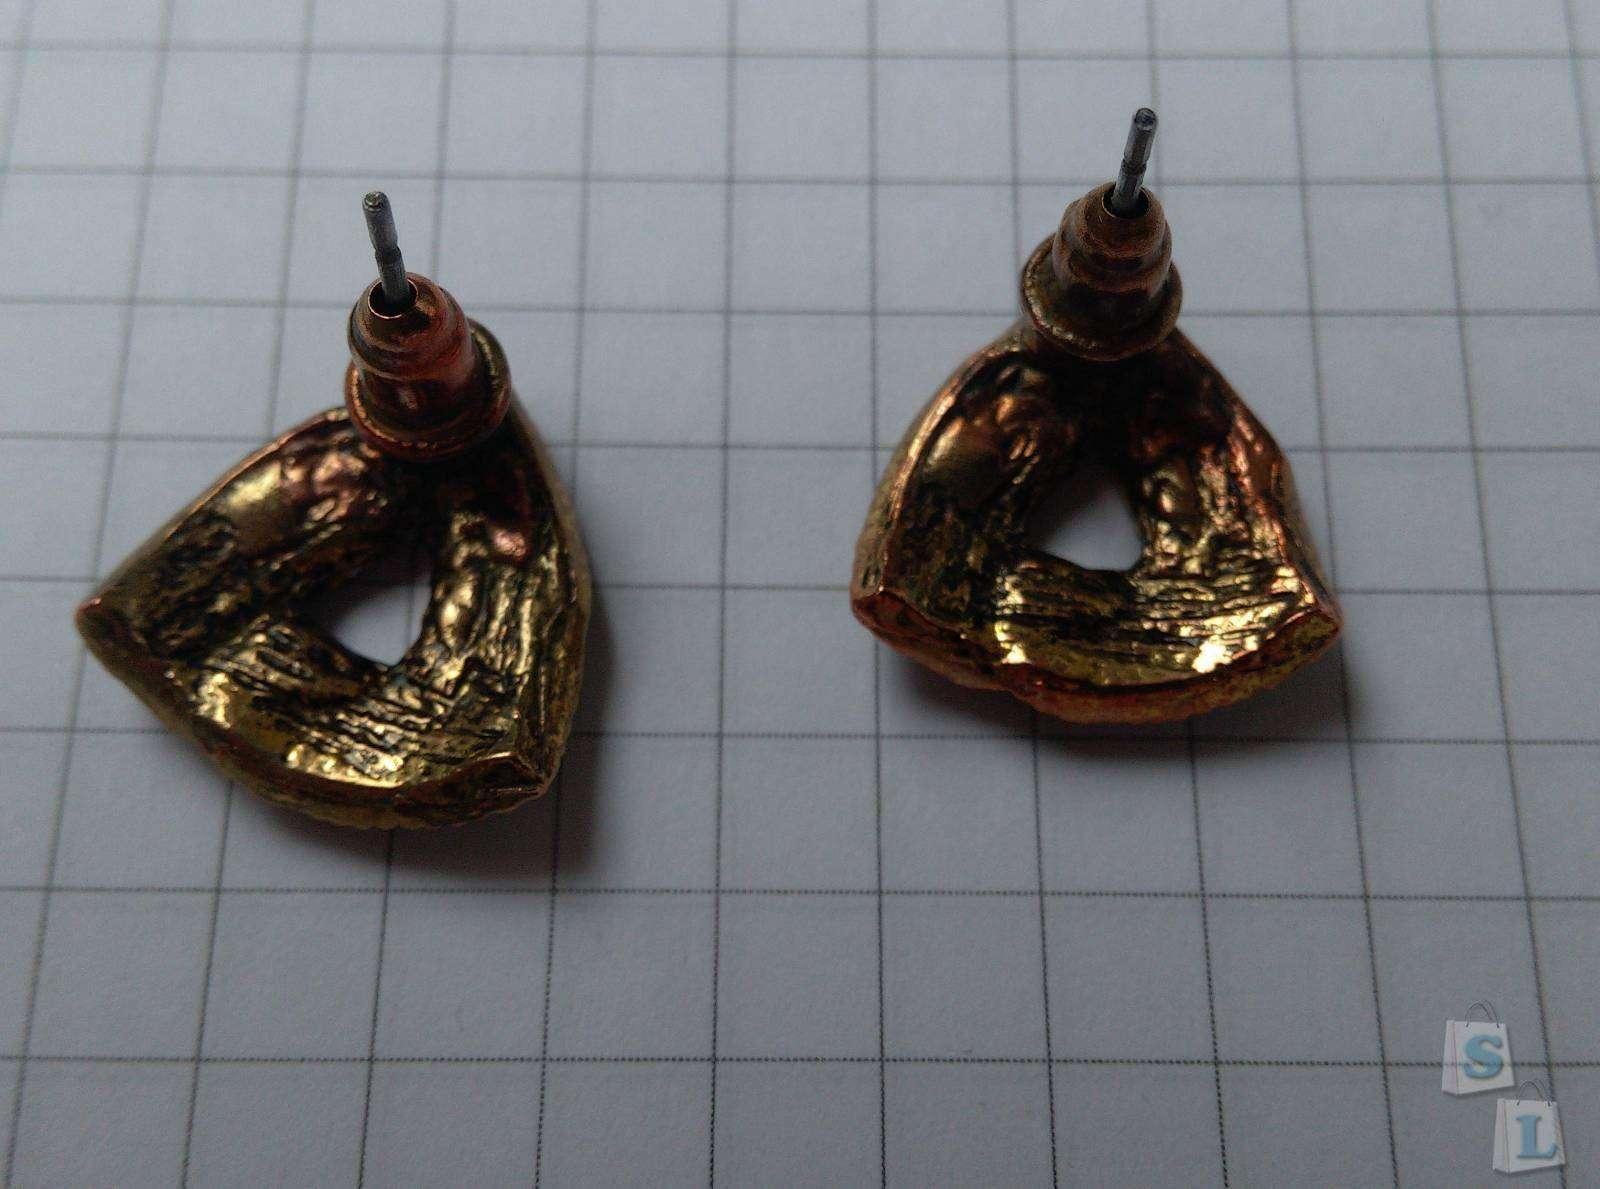 Aliexpress: Серьги-гвоздики с кристаллами